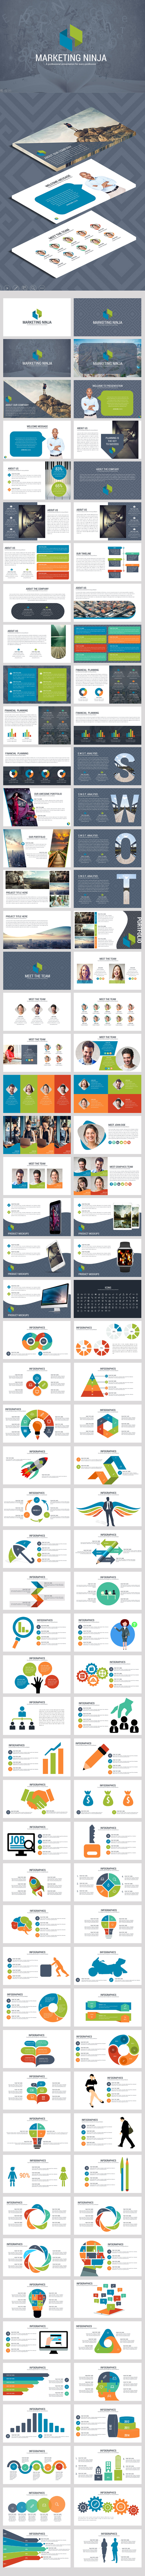 Marketing Ninja Google Slides Presentation - Google Slides Presentation Templates